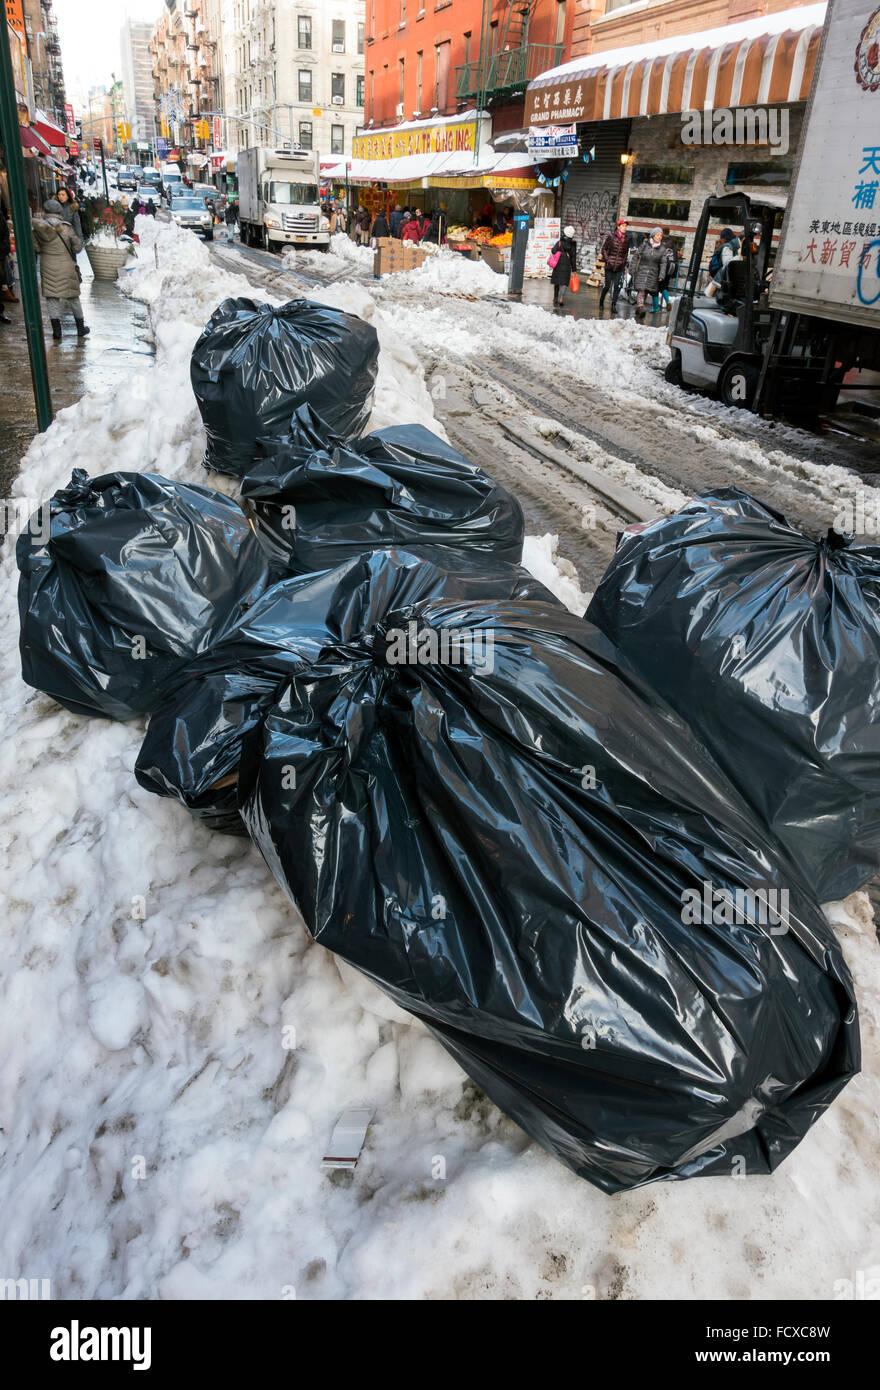 Art Bag Nyc Garbage Bags New York City Usa Stock Photo Royalty Free Image